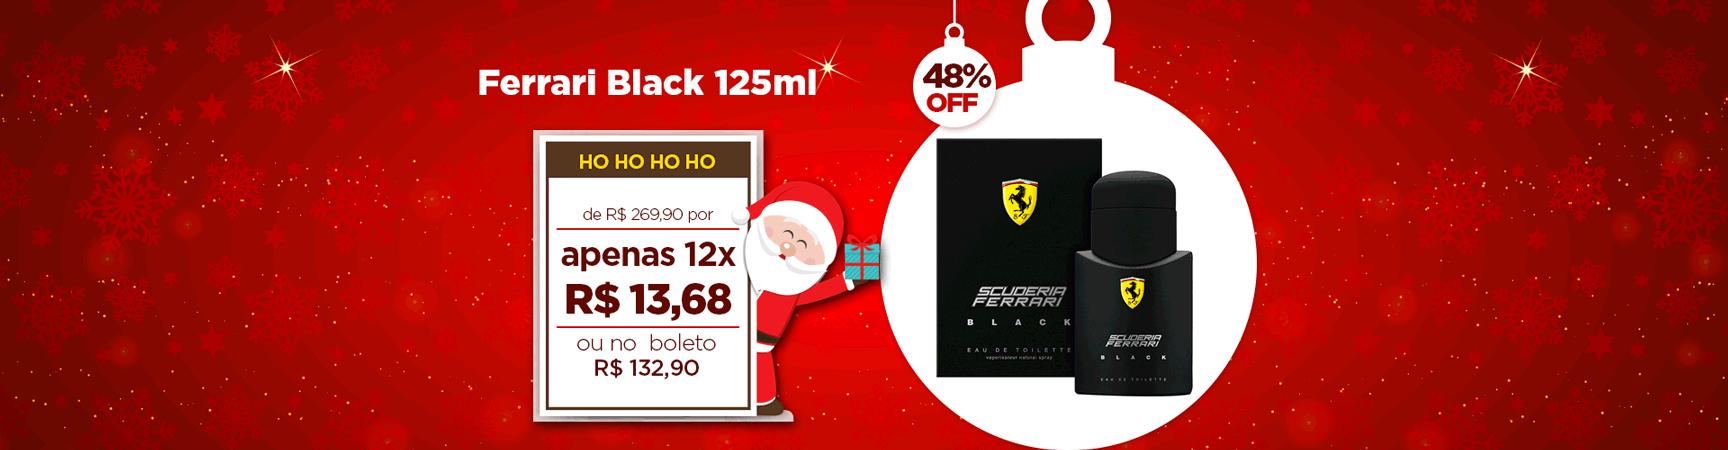 Natal Ferrari Black